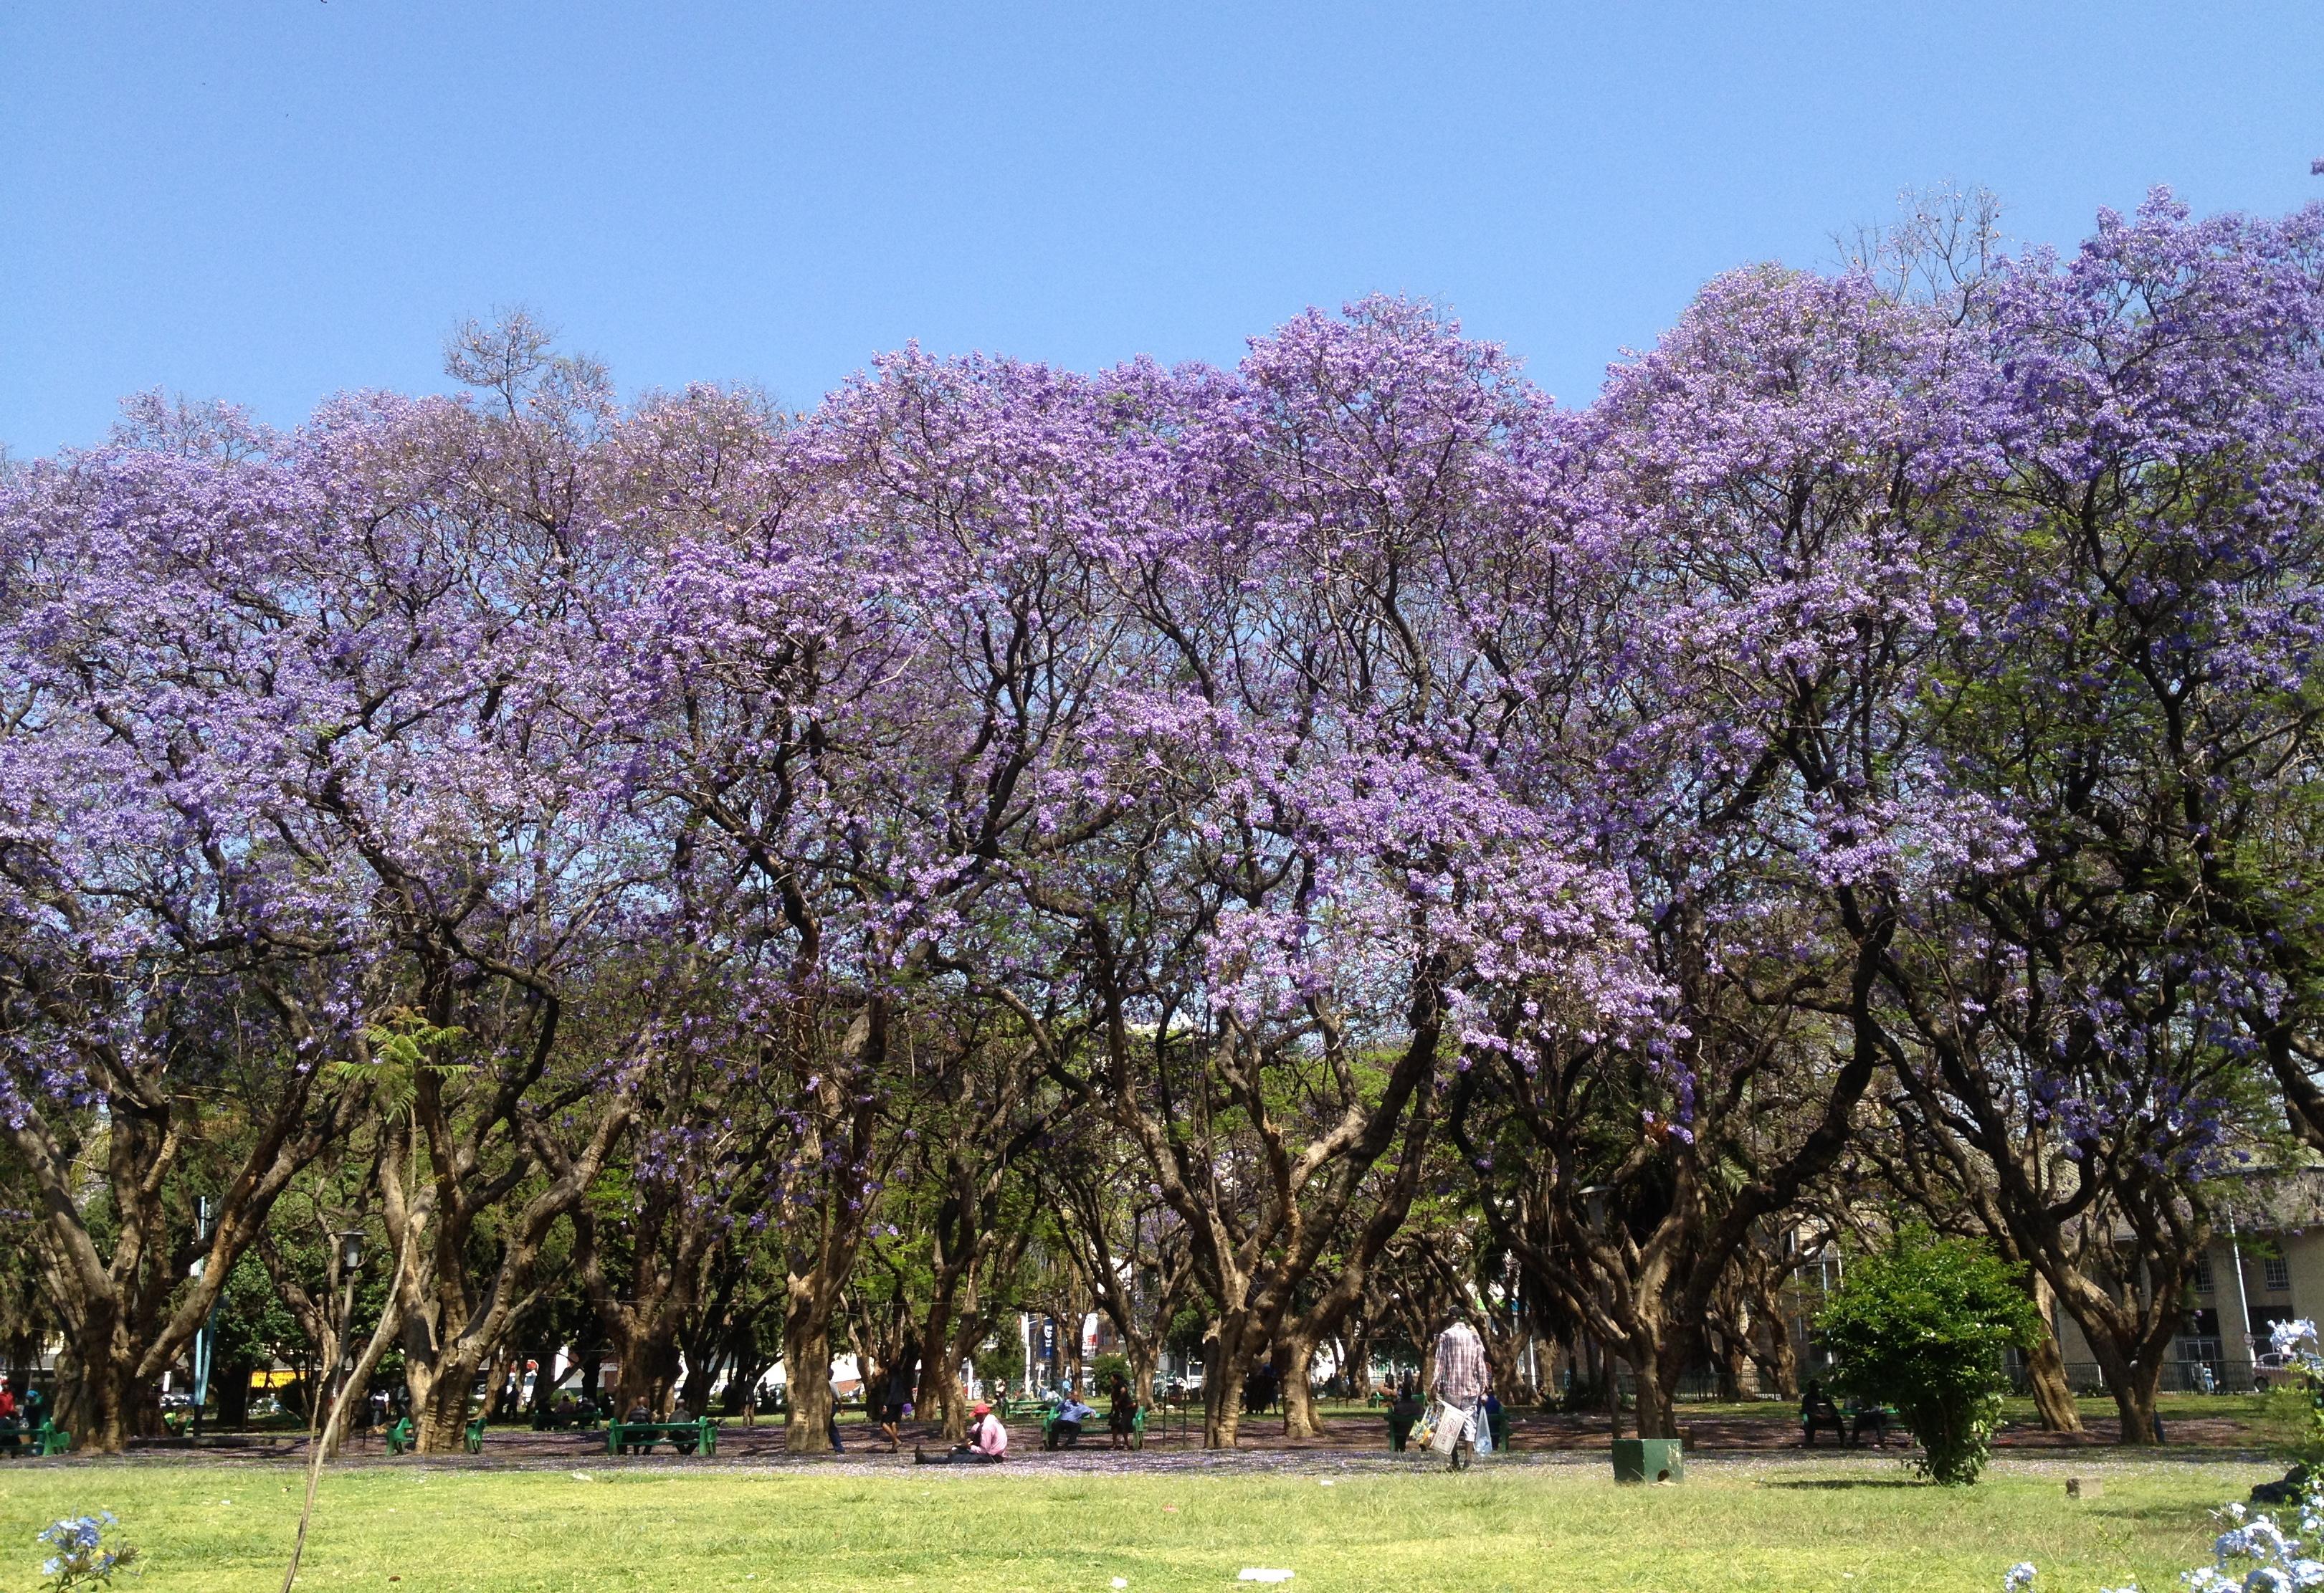 Brazil In Zimbabwe: Harare's Jacaranda Trees